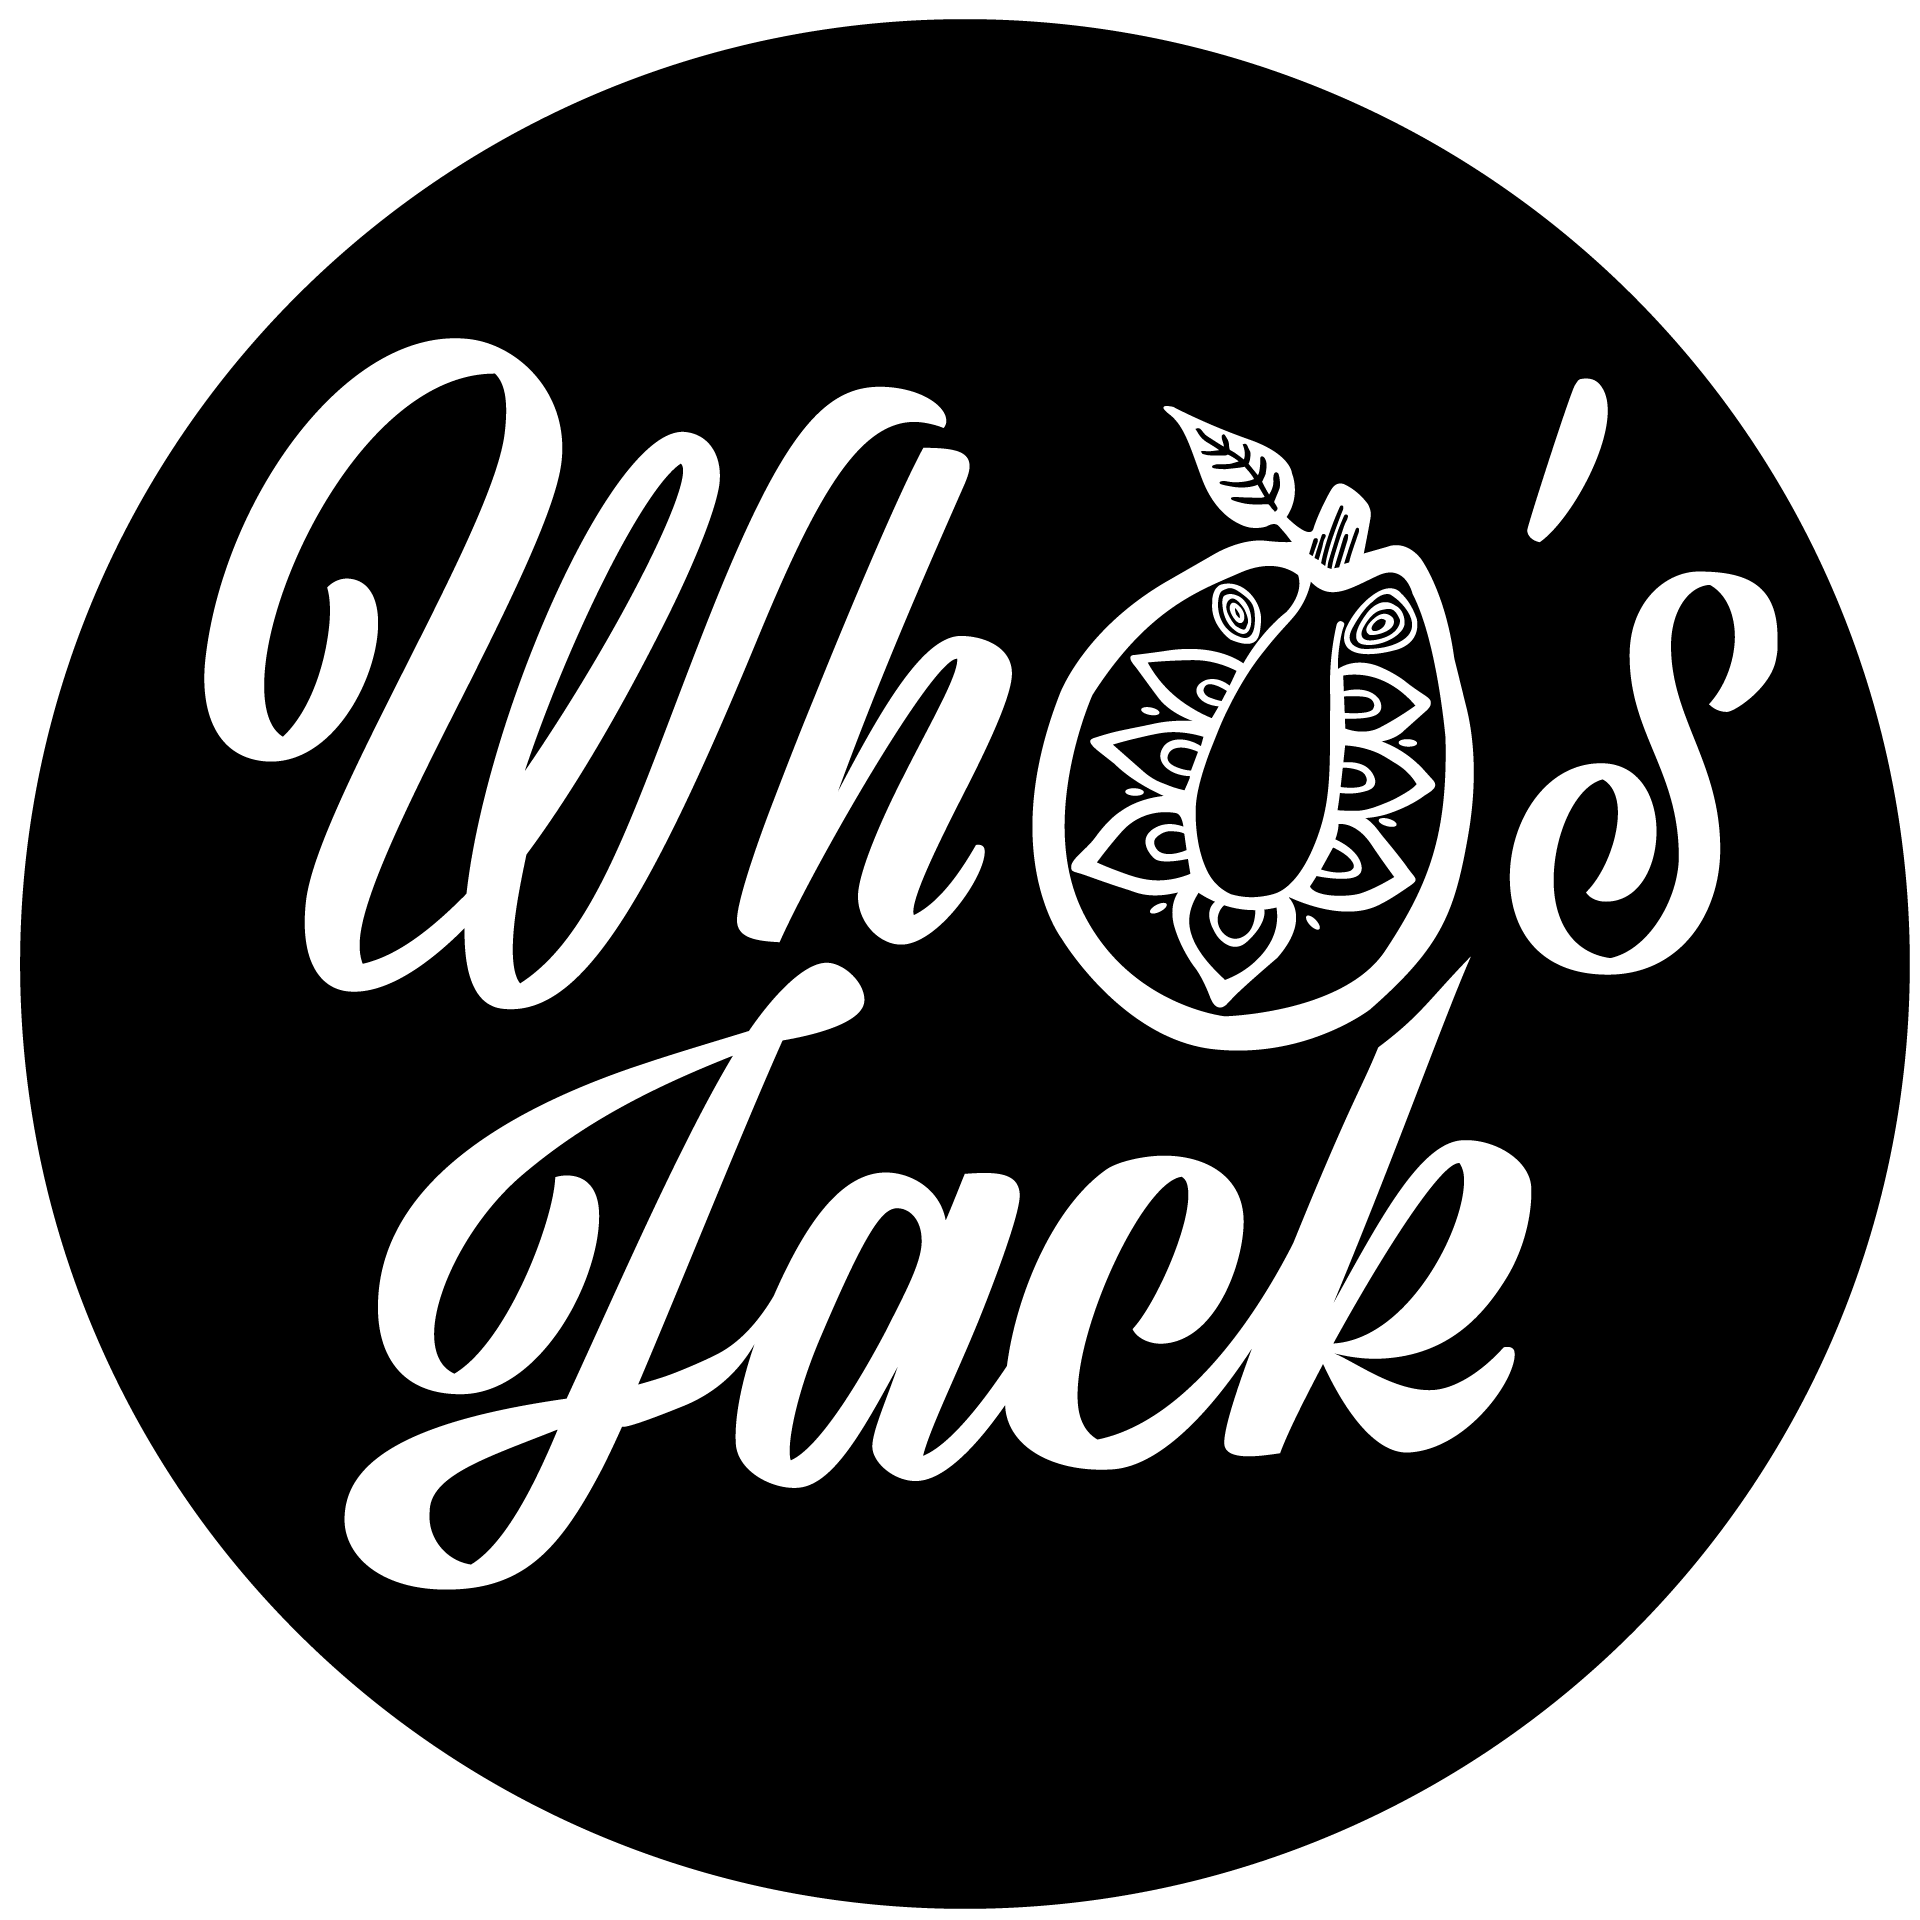 WHO'S JACK